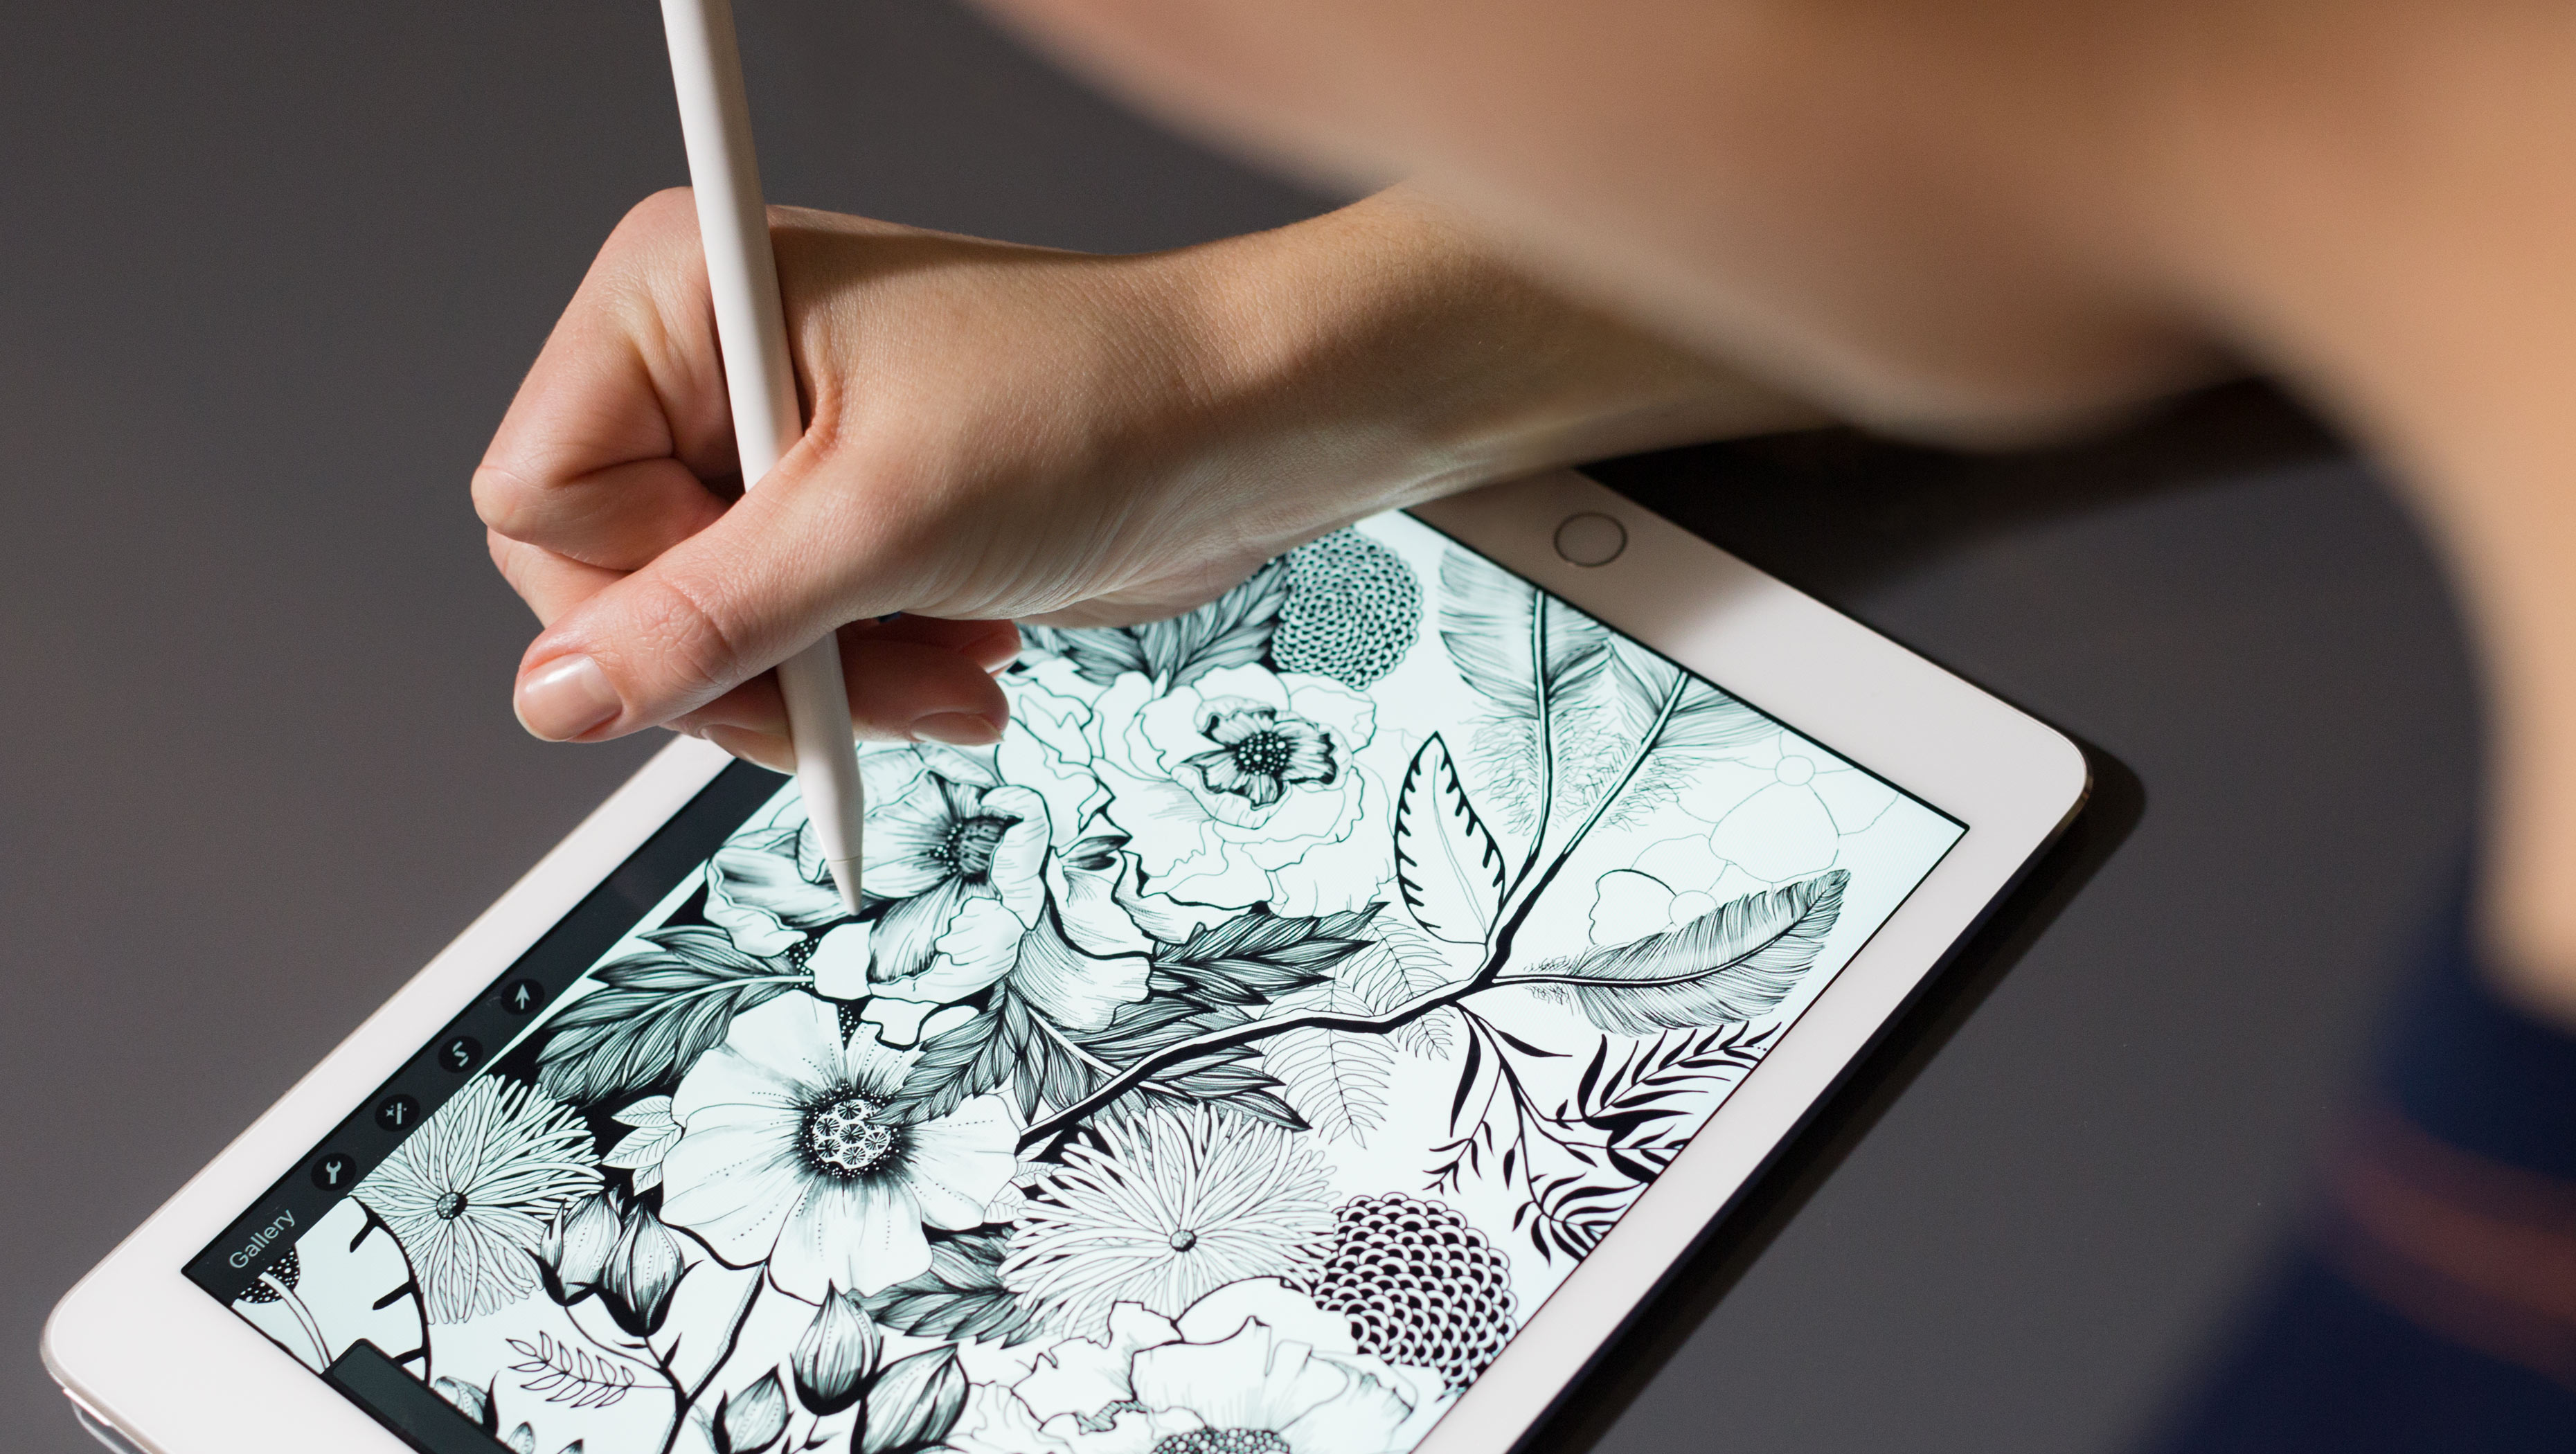 Apple Pencil e iPad Pro de 9,7 polegadas